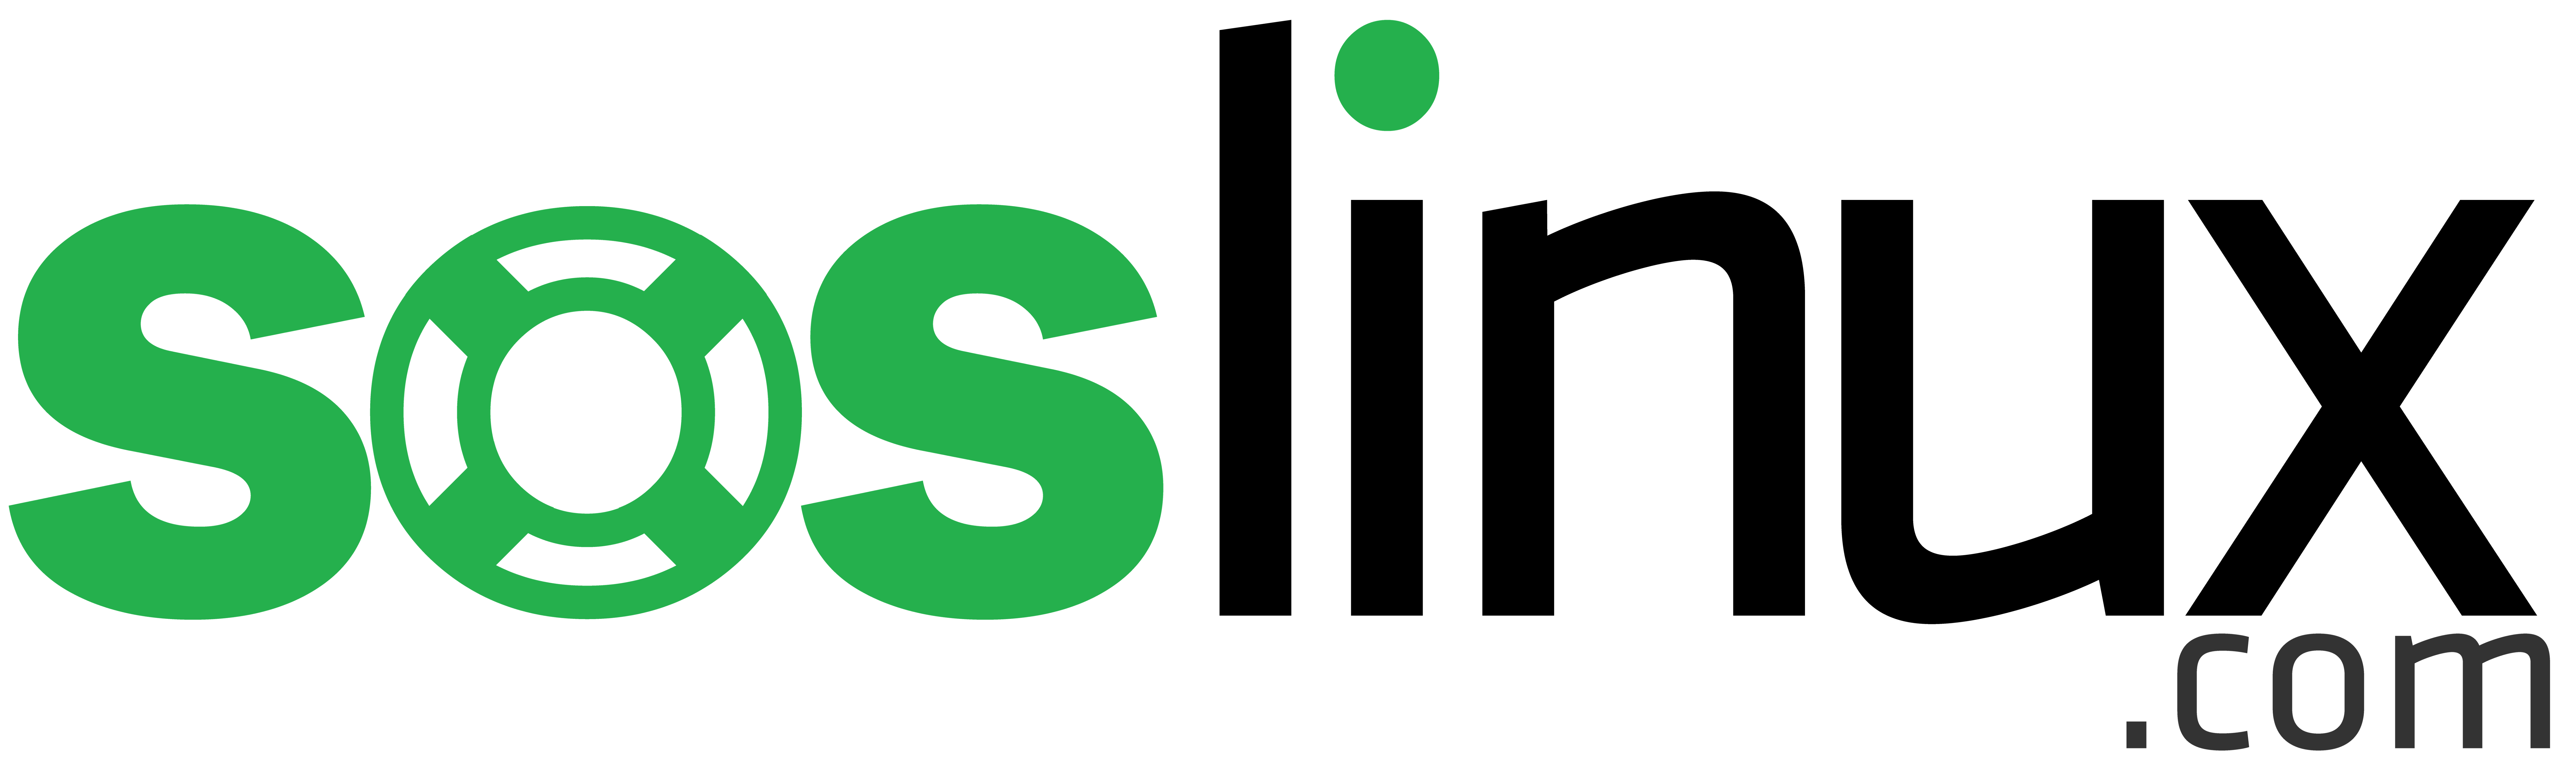 soslinux-06